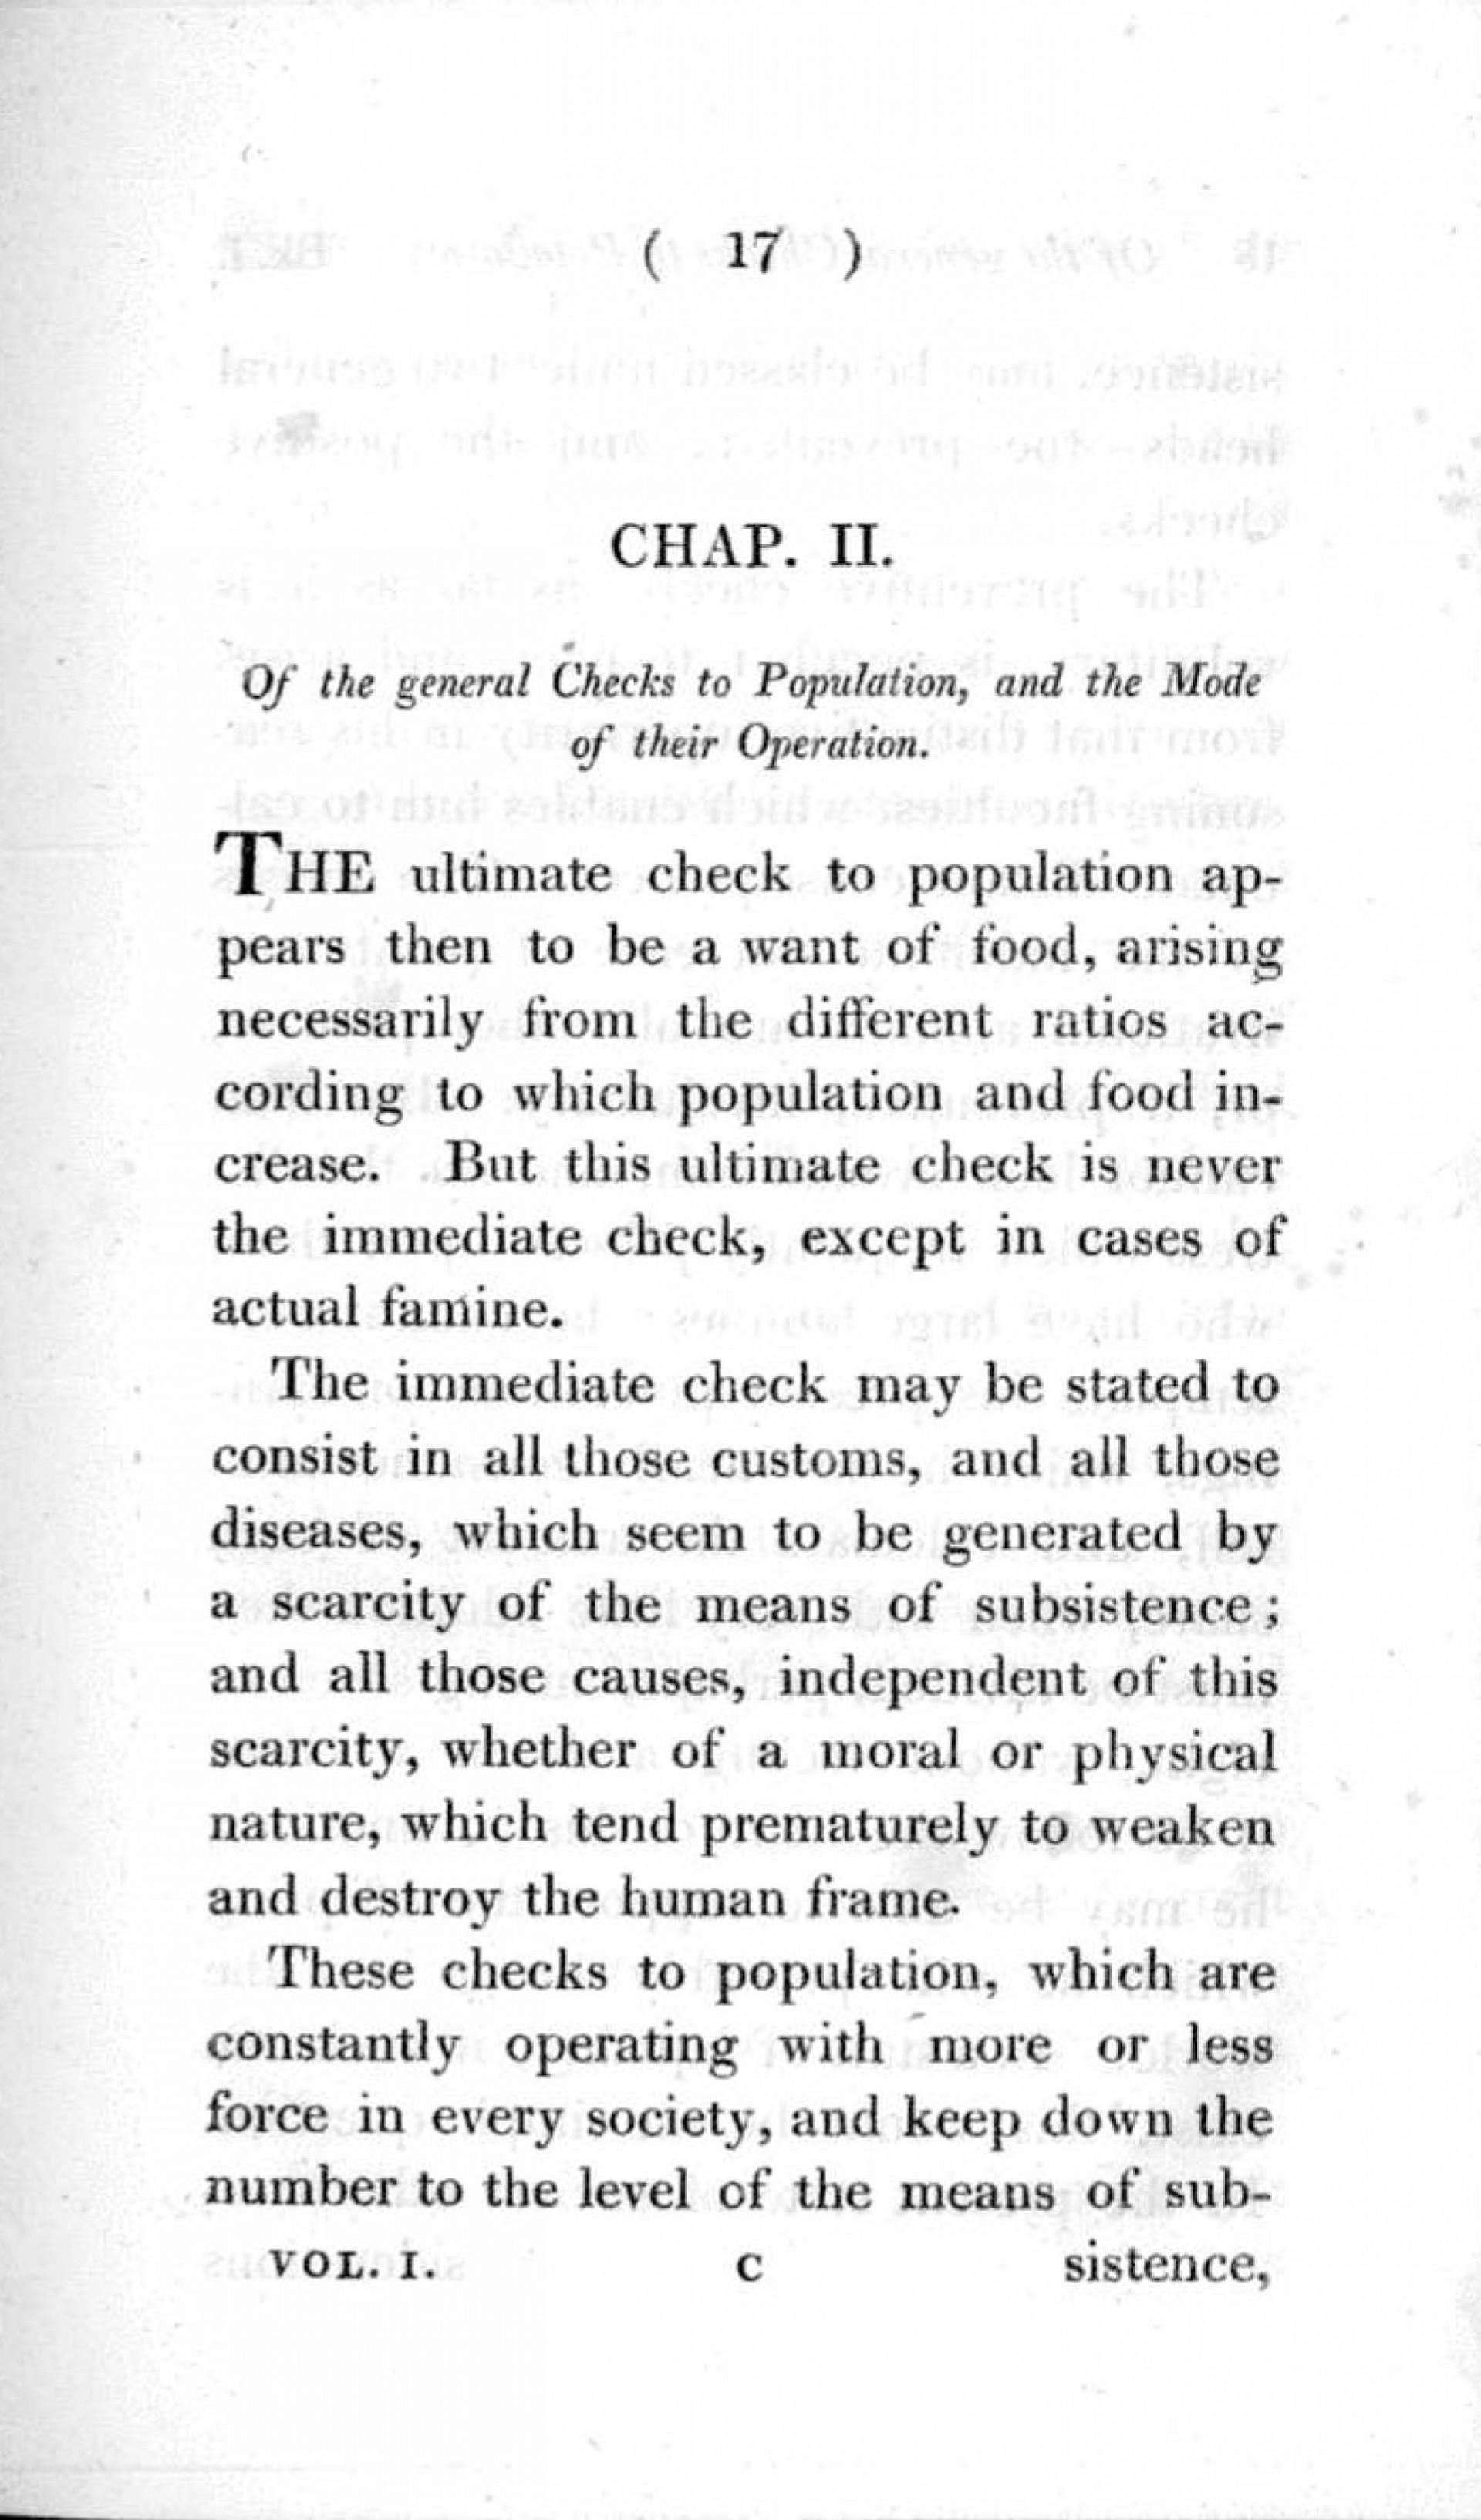 012 Essay Example On The Principle Of Singular Population Pdf By Thomas Malthus Main Idea 1920